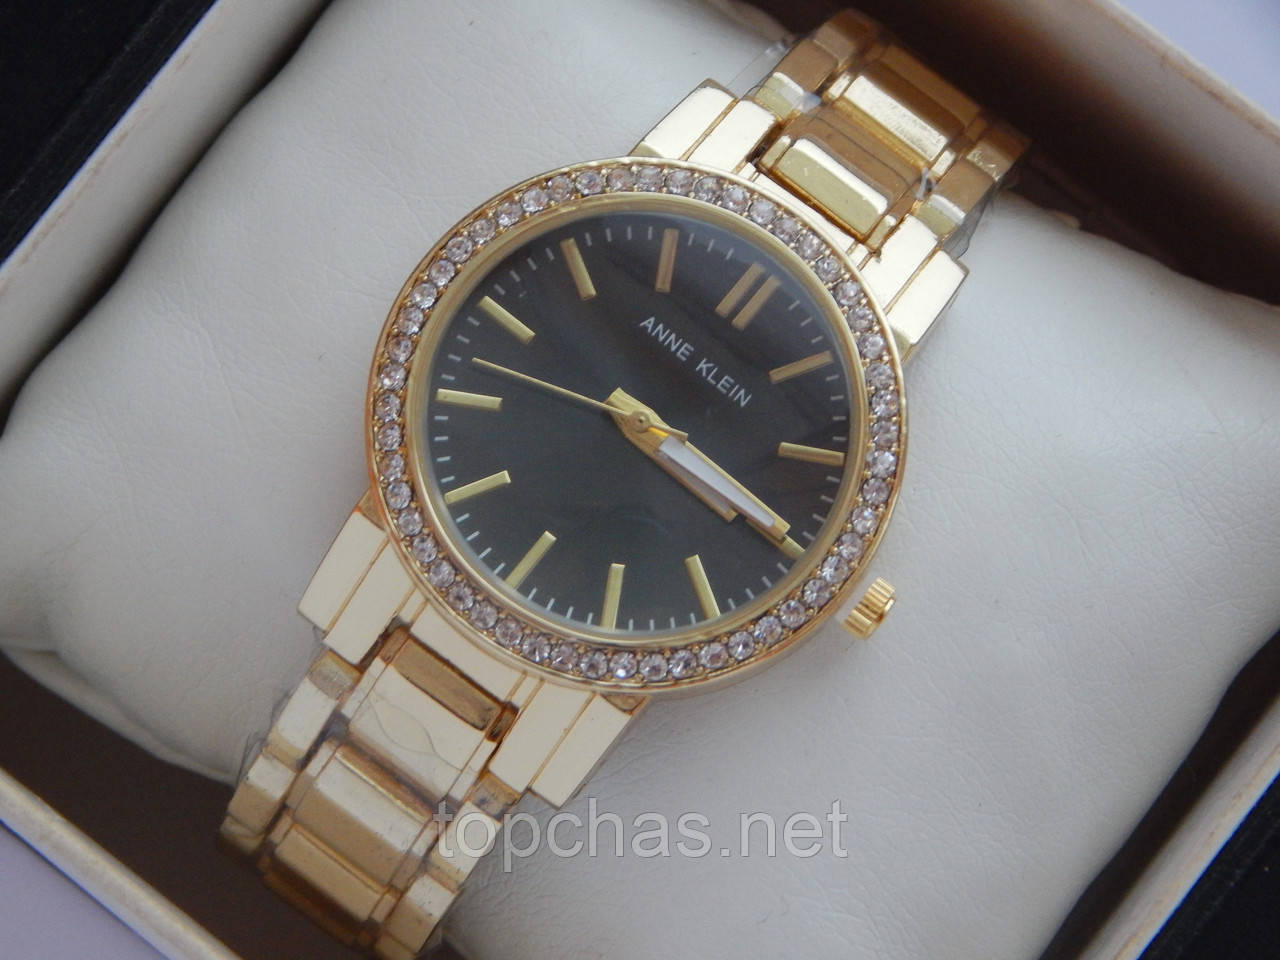 Женские кварцевые наручные часы Anne Klein на металлическом браслете, фото 1